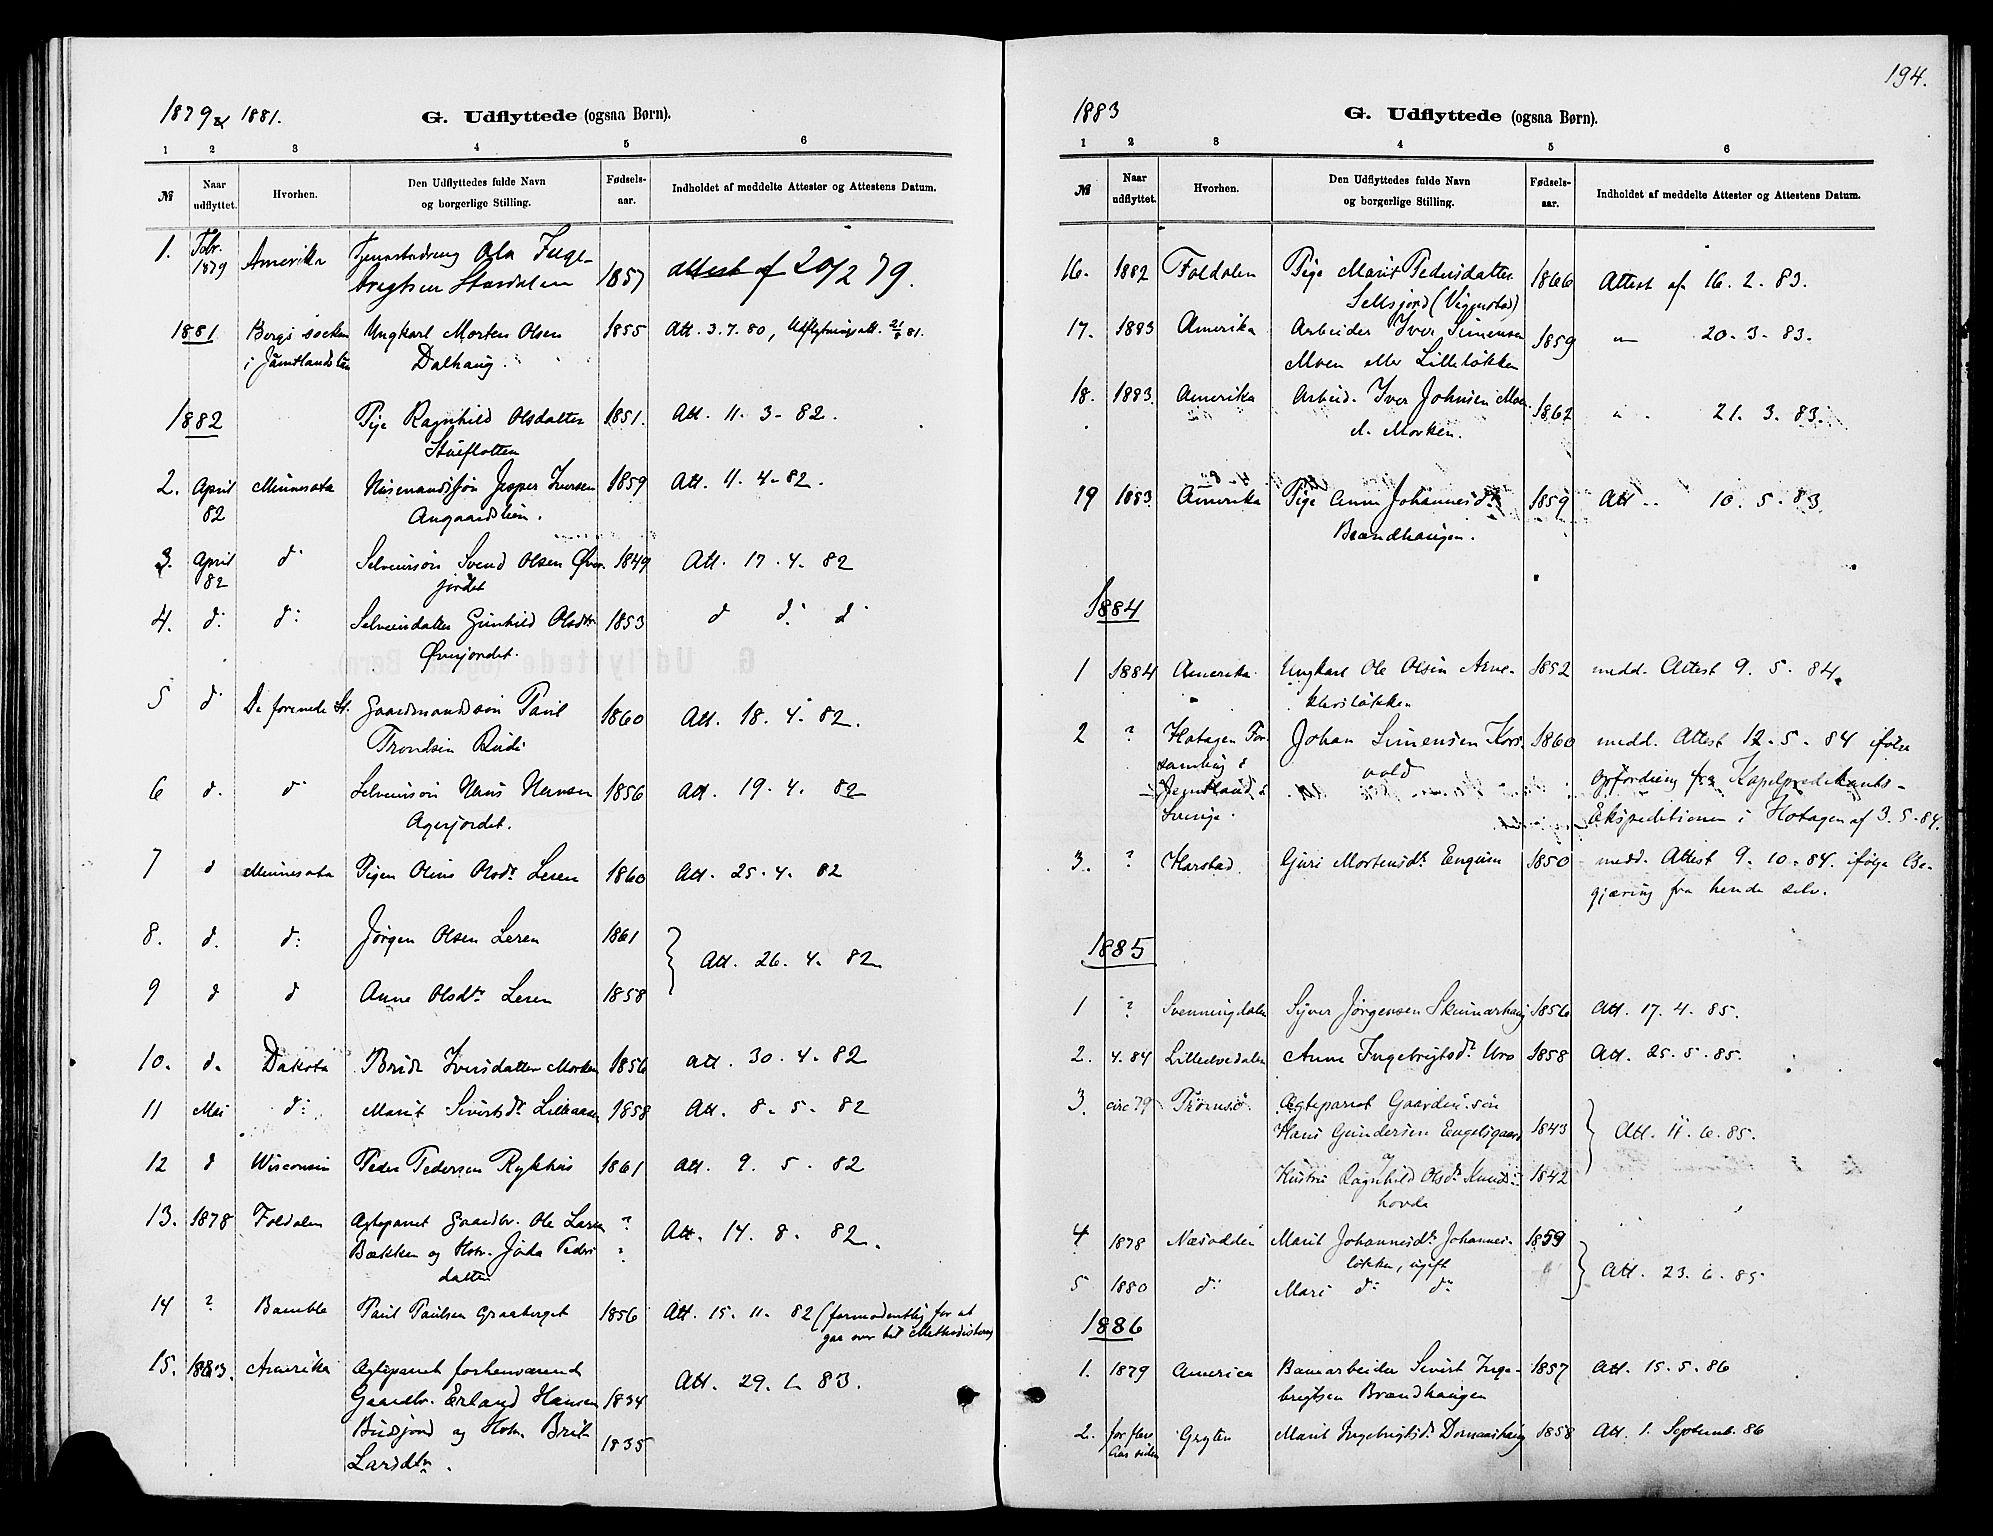 SAH, Dovre prestekontor, Ministerialbok nr. 2, 1879-1890, s. 194